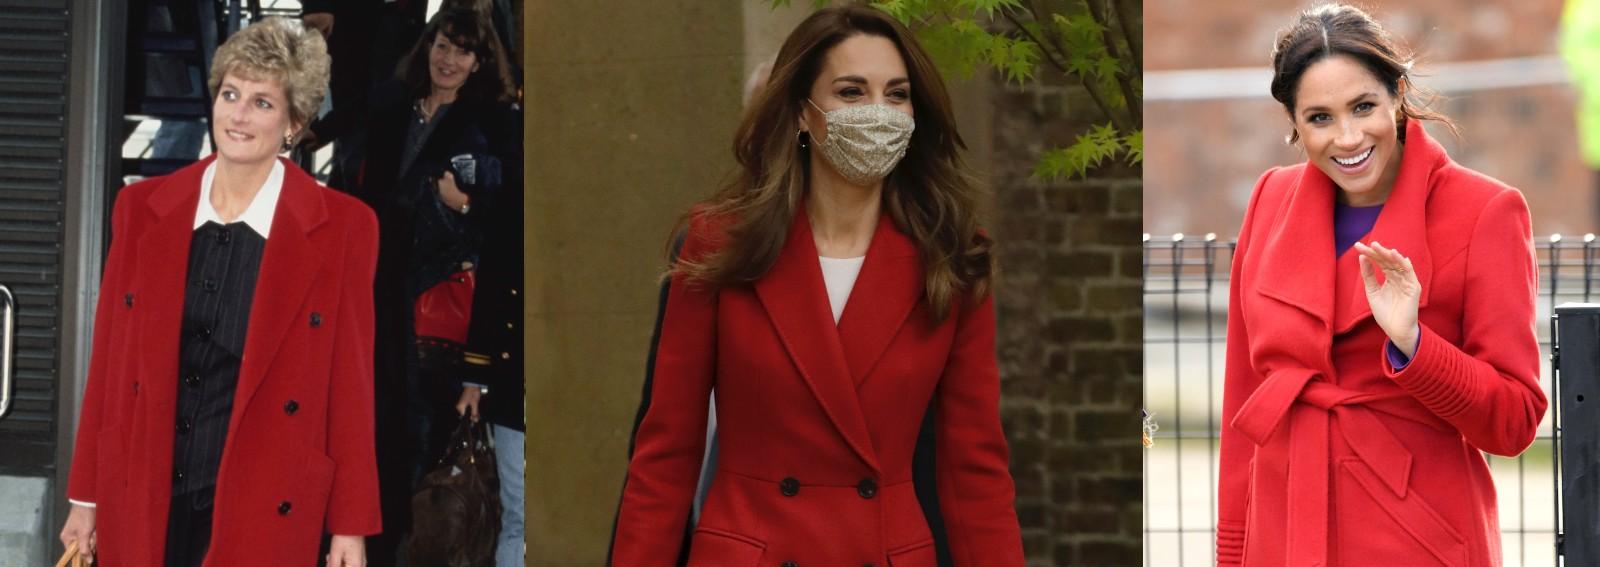 royal trend cappotto rosso